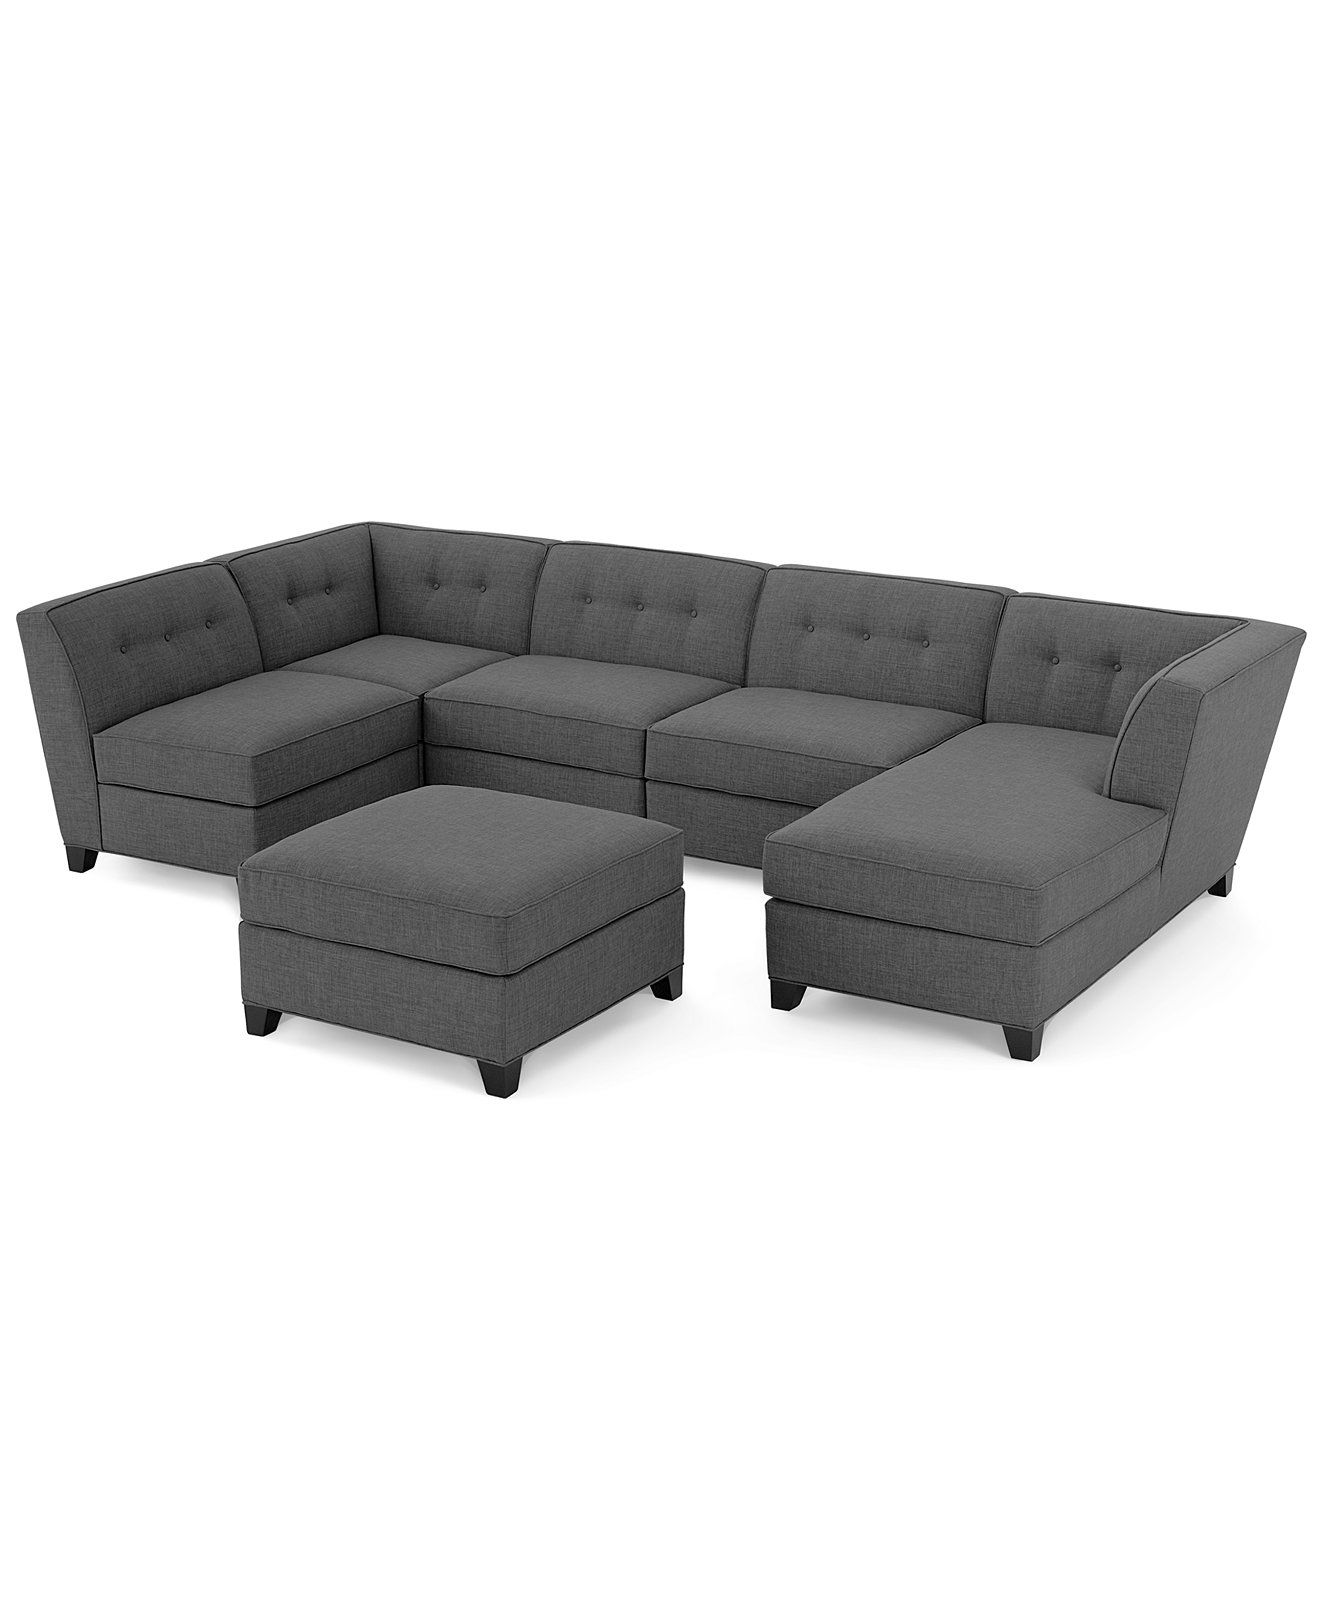 Harper Fabric 6 Piece Modular Sectional Sofa Wrap Around Sofas With Ottoman